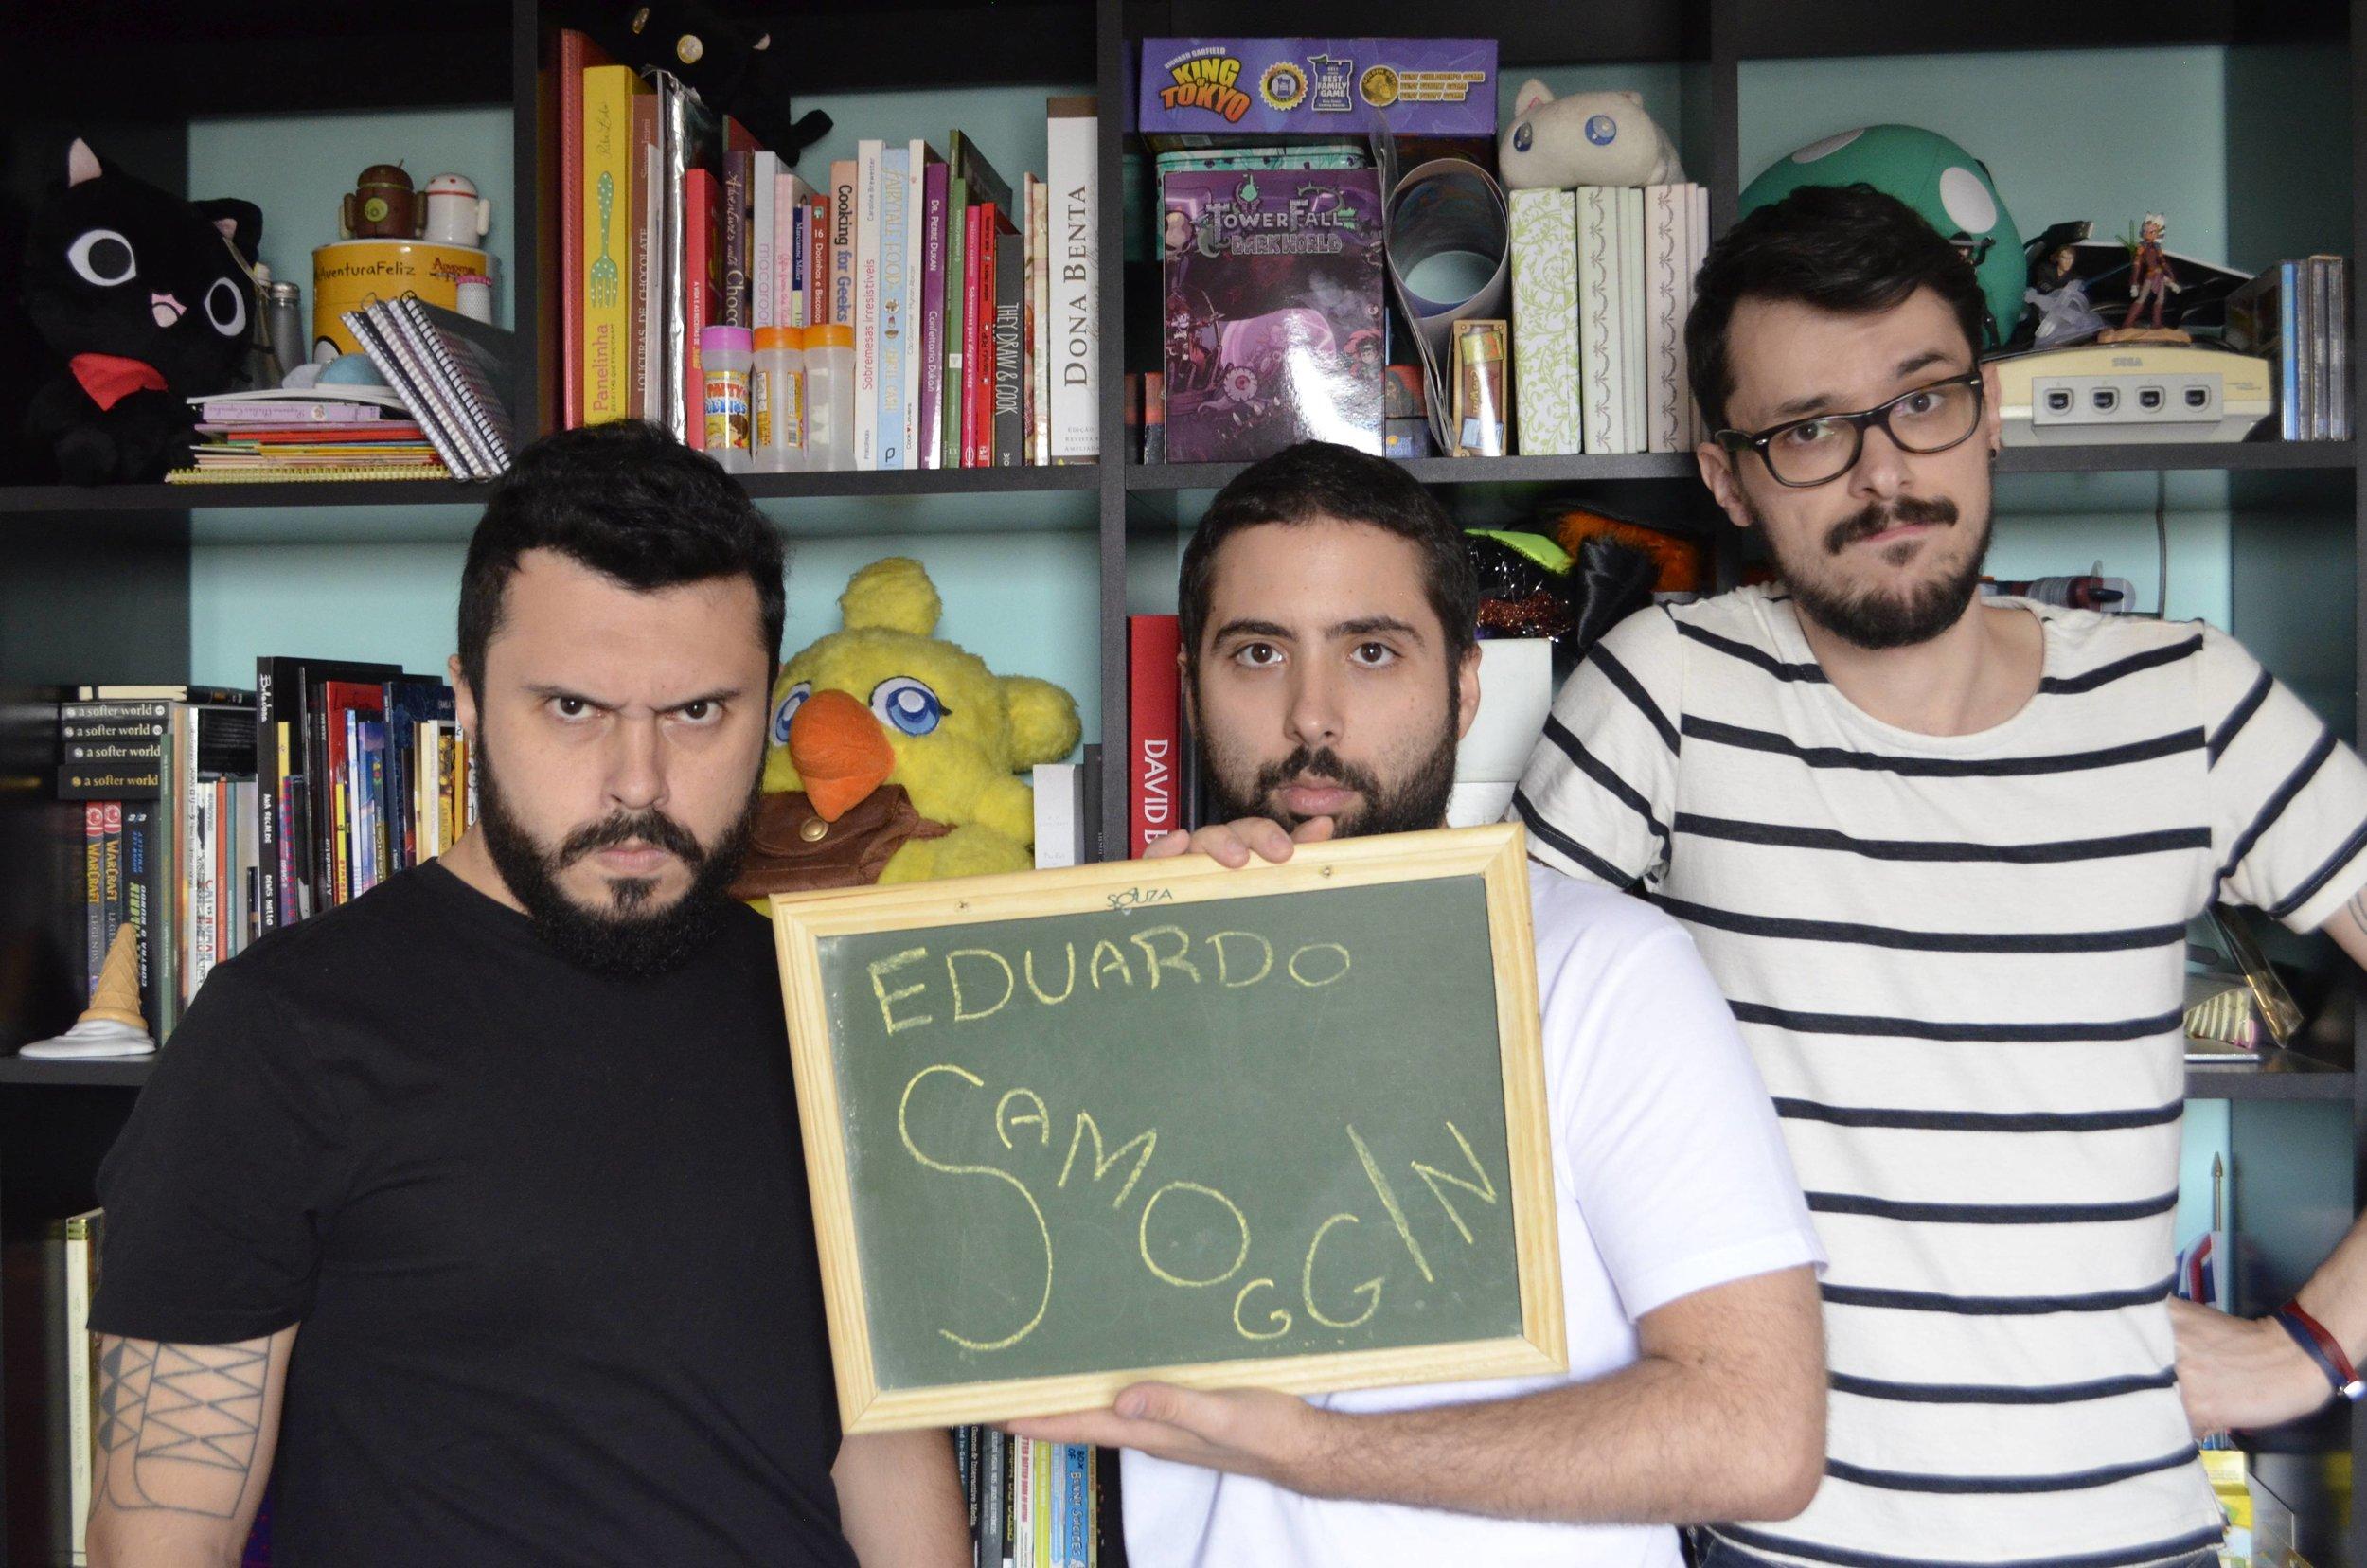 Eduardo-Samoggin.jpg